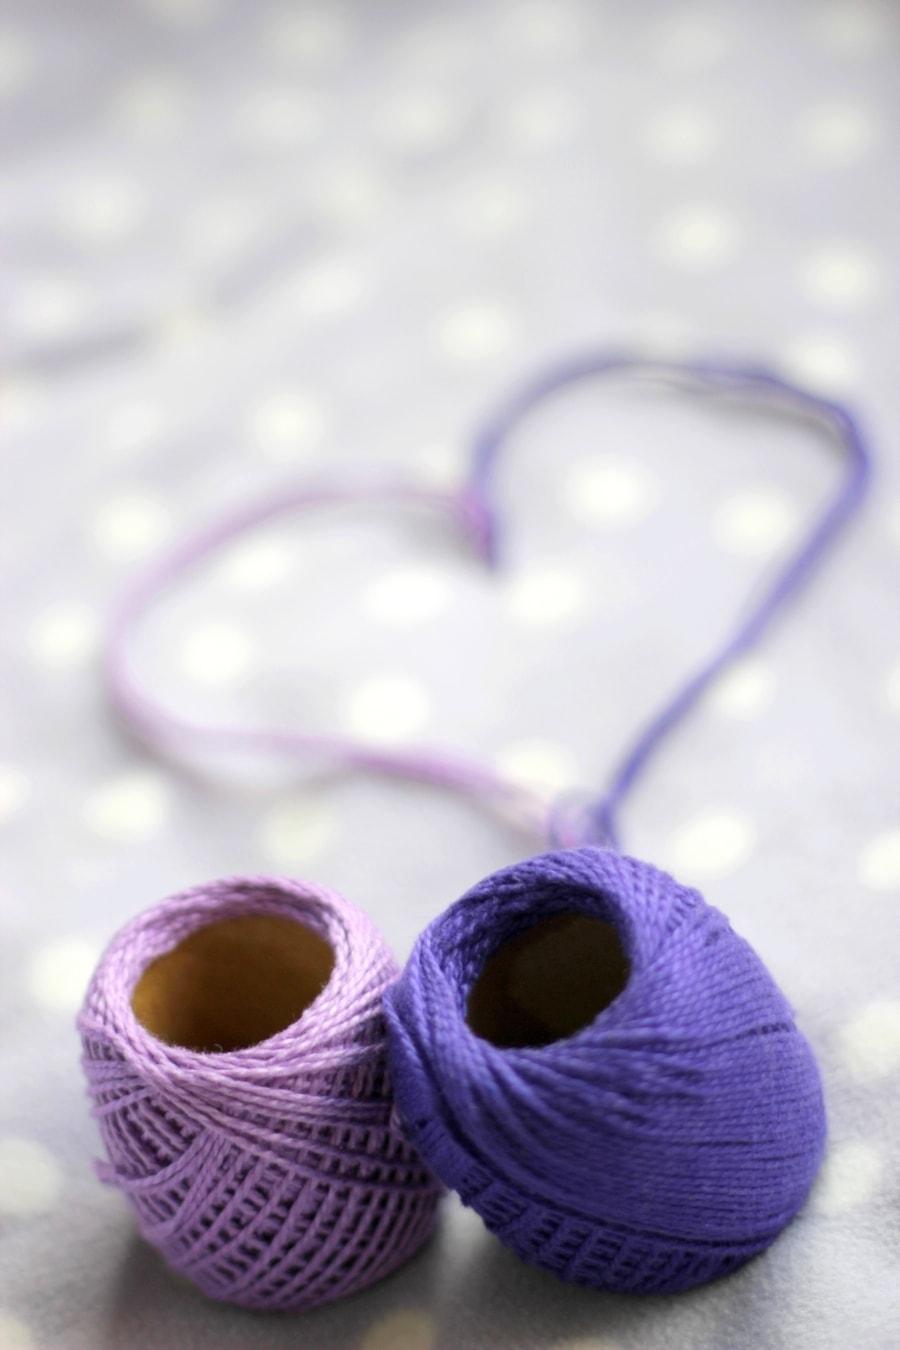 Balls of yarn in purple creating a heart